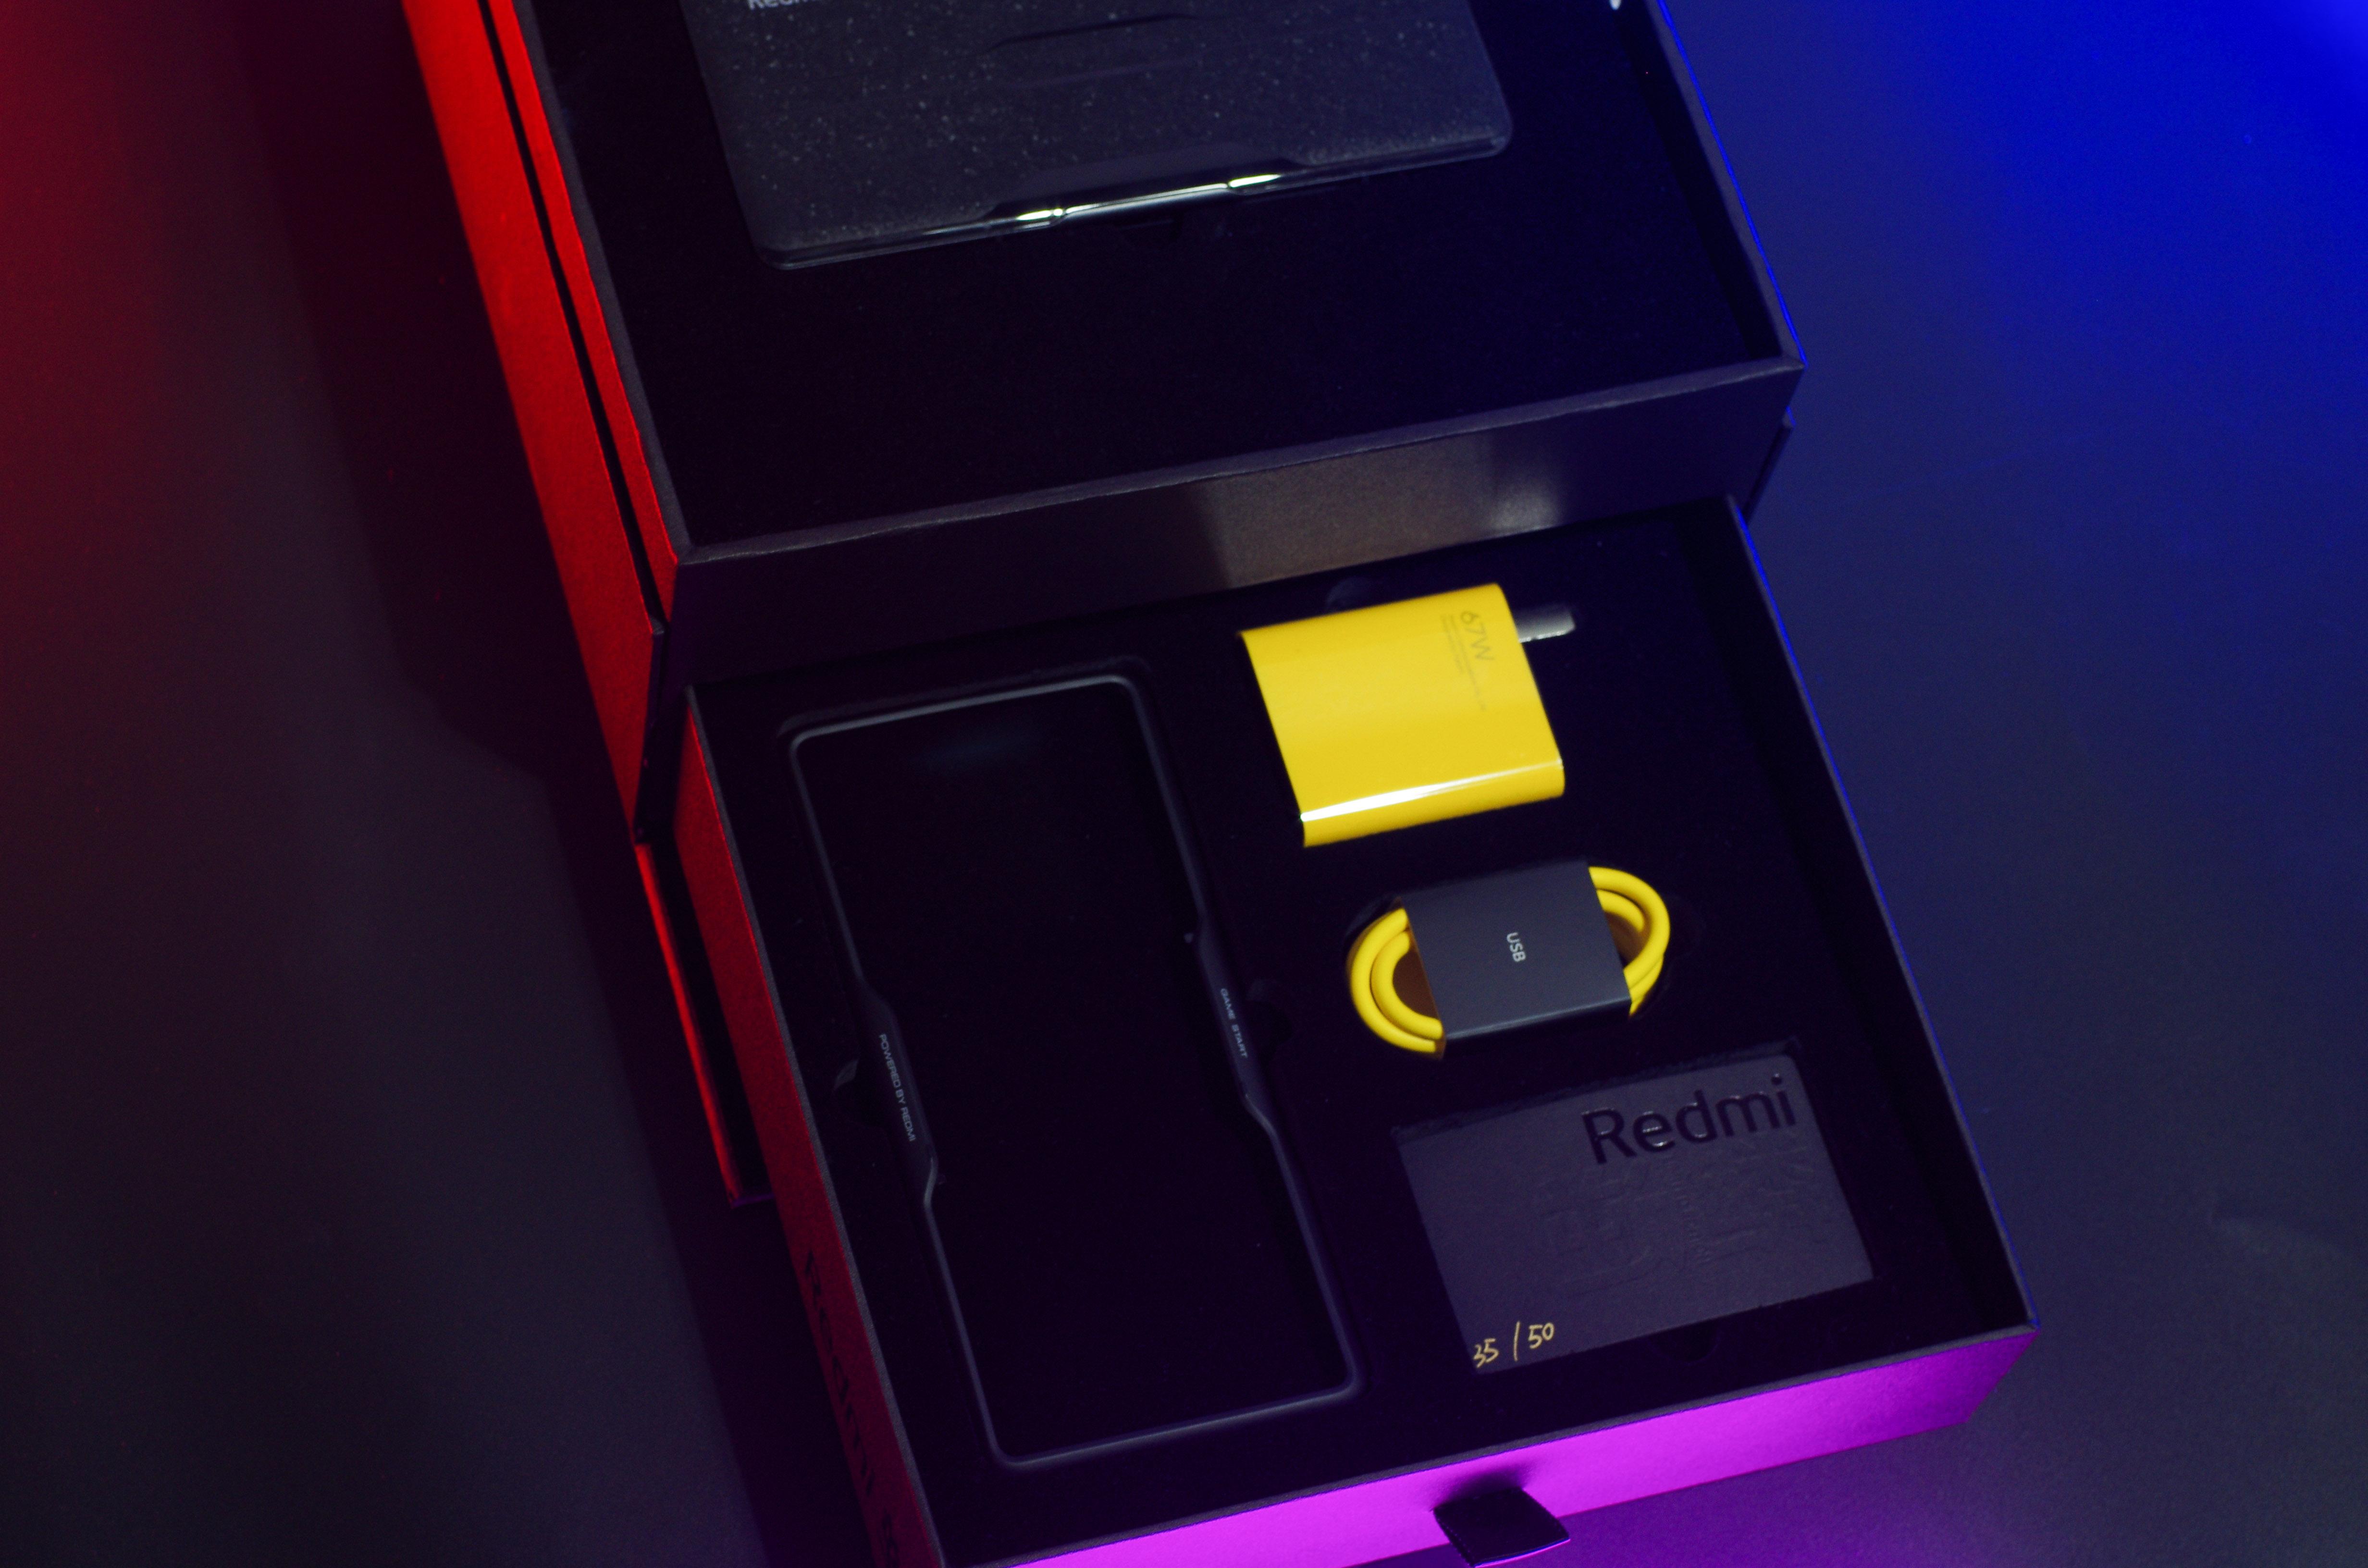 Redmi K40游戏版特别款图赏:每台都独一无二!